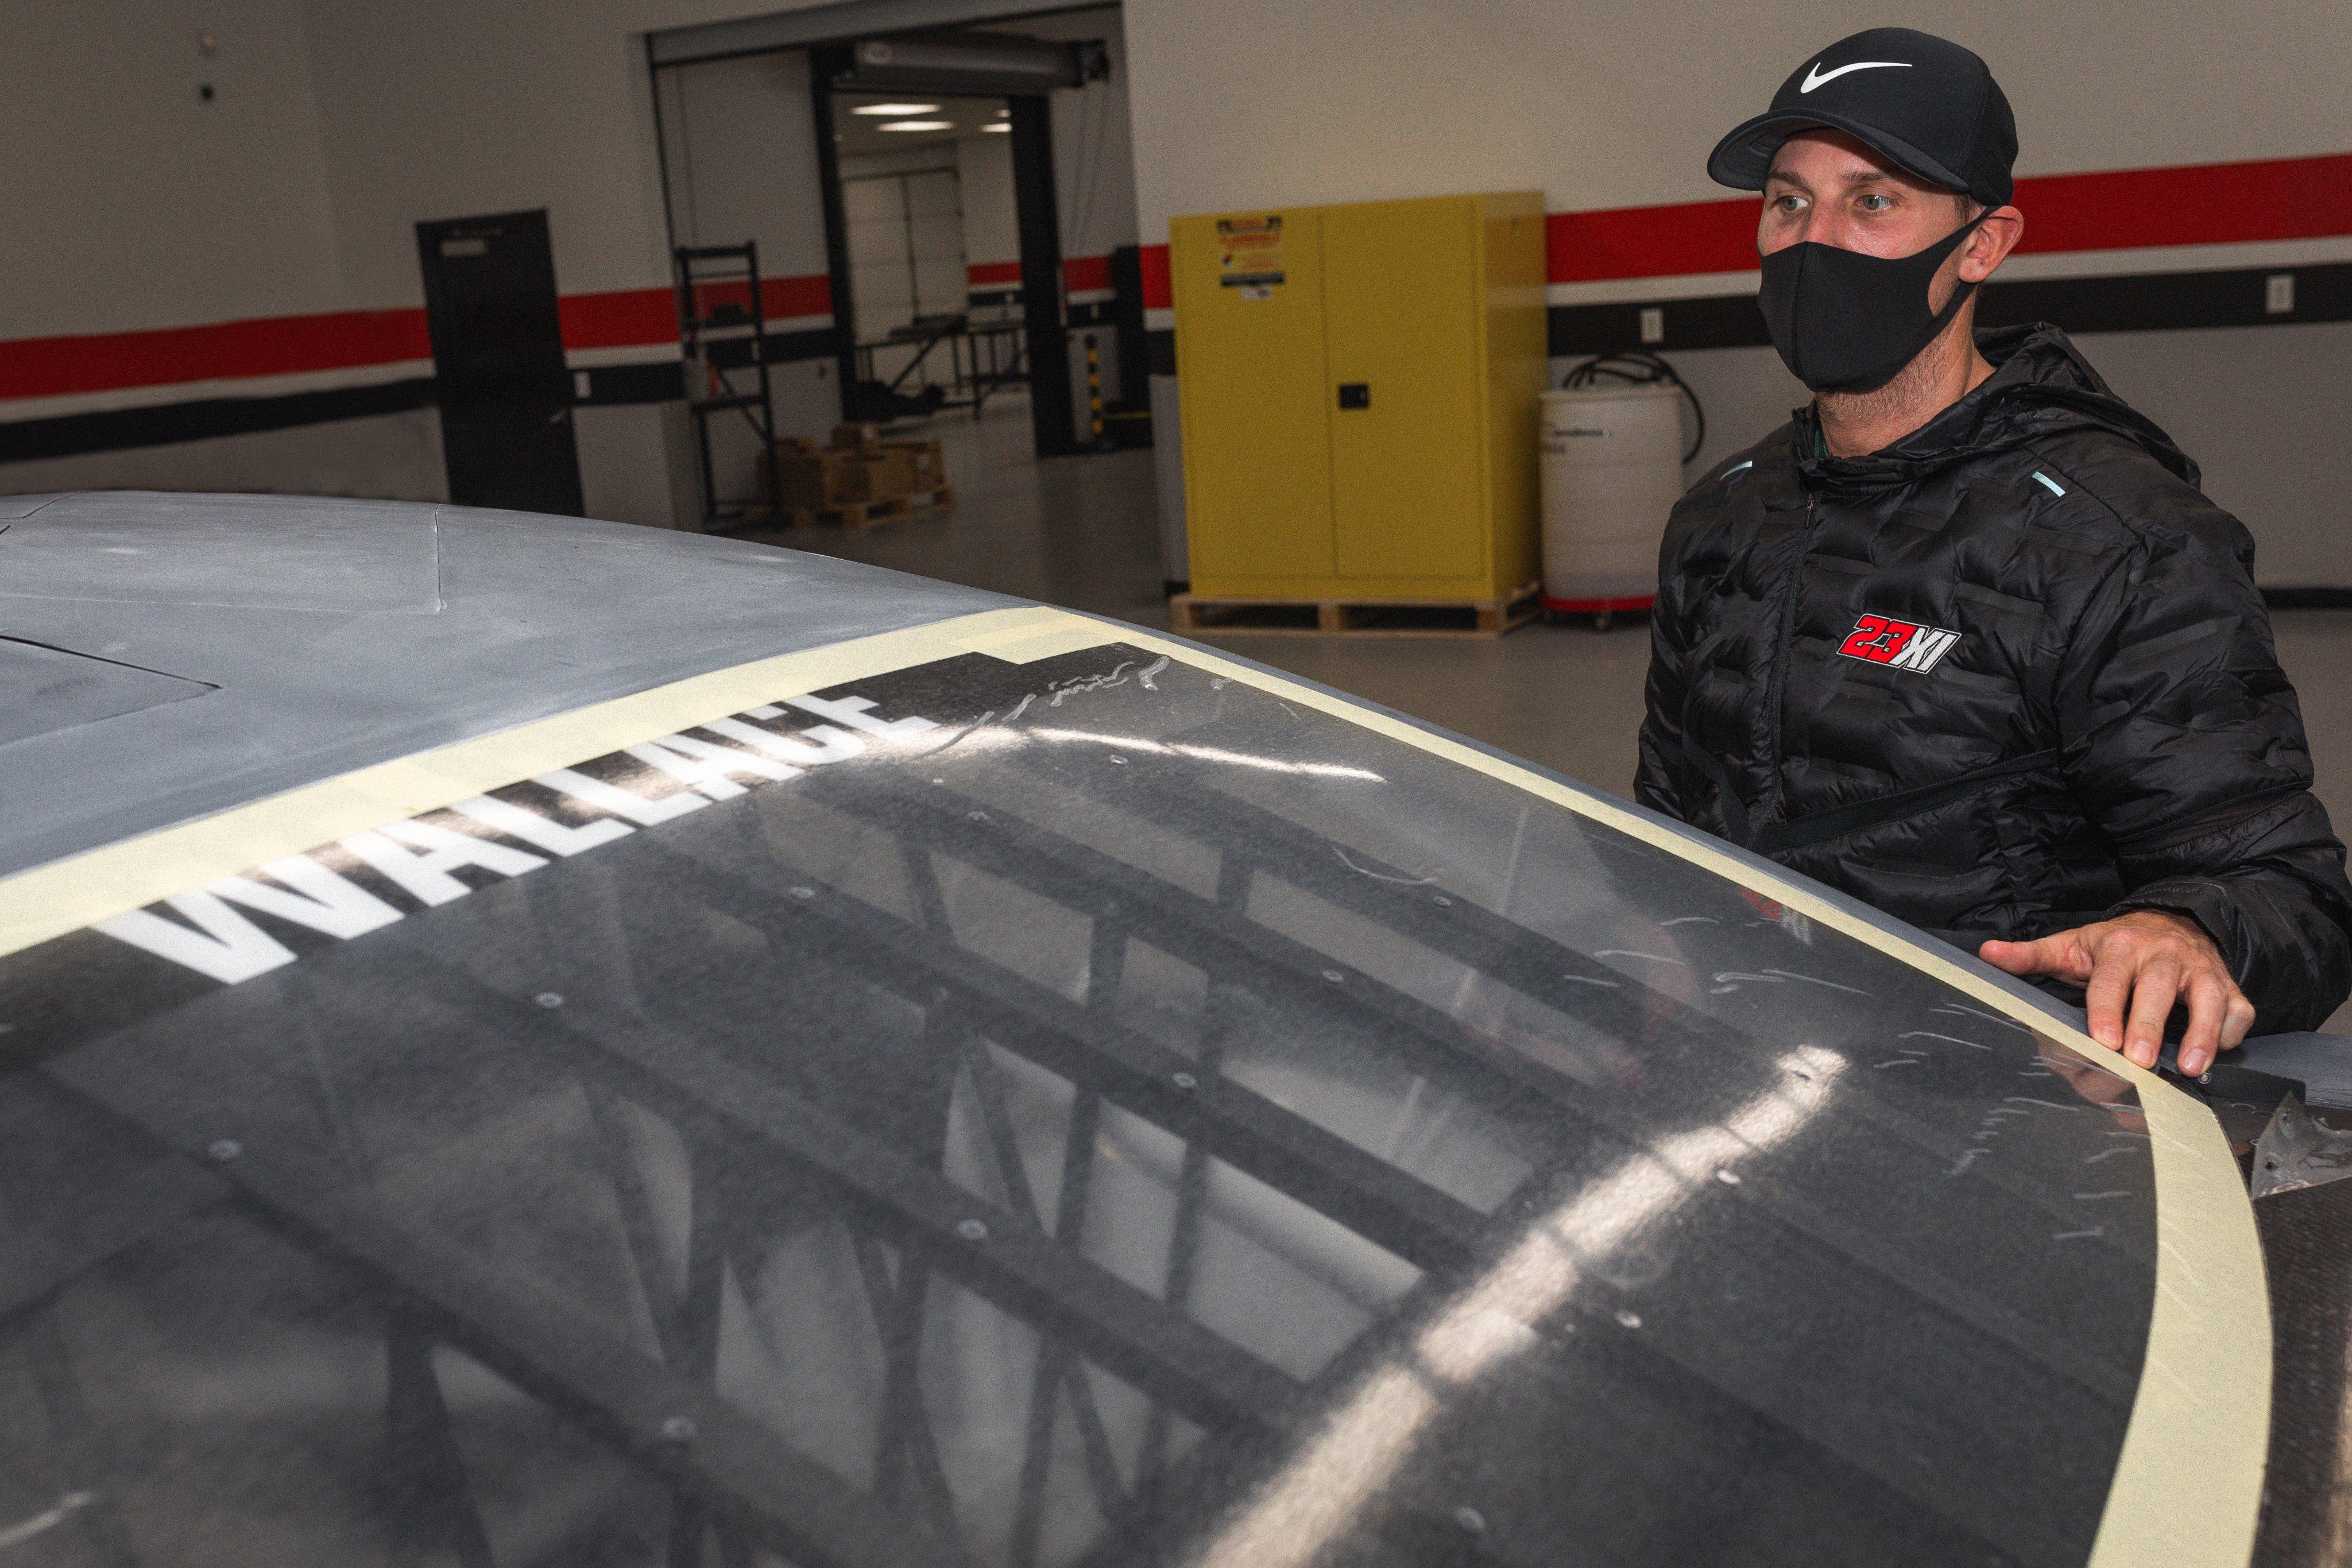 Denny Hamlin - First 23XI Racing car